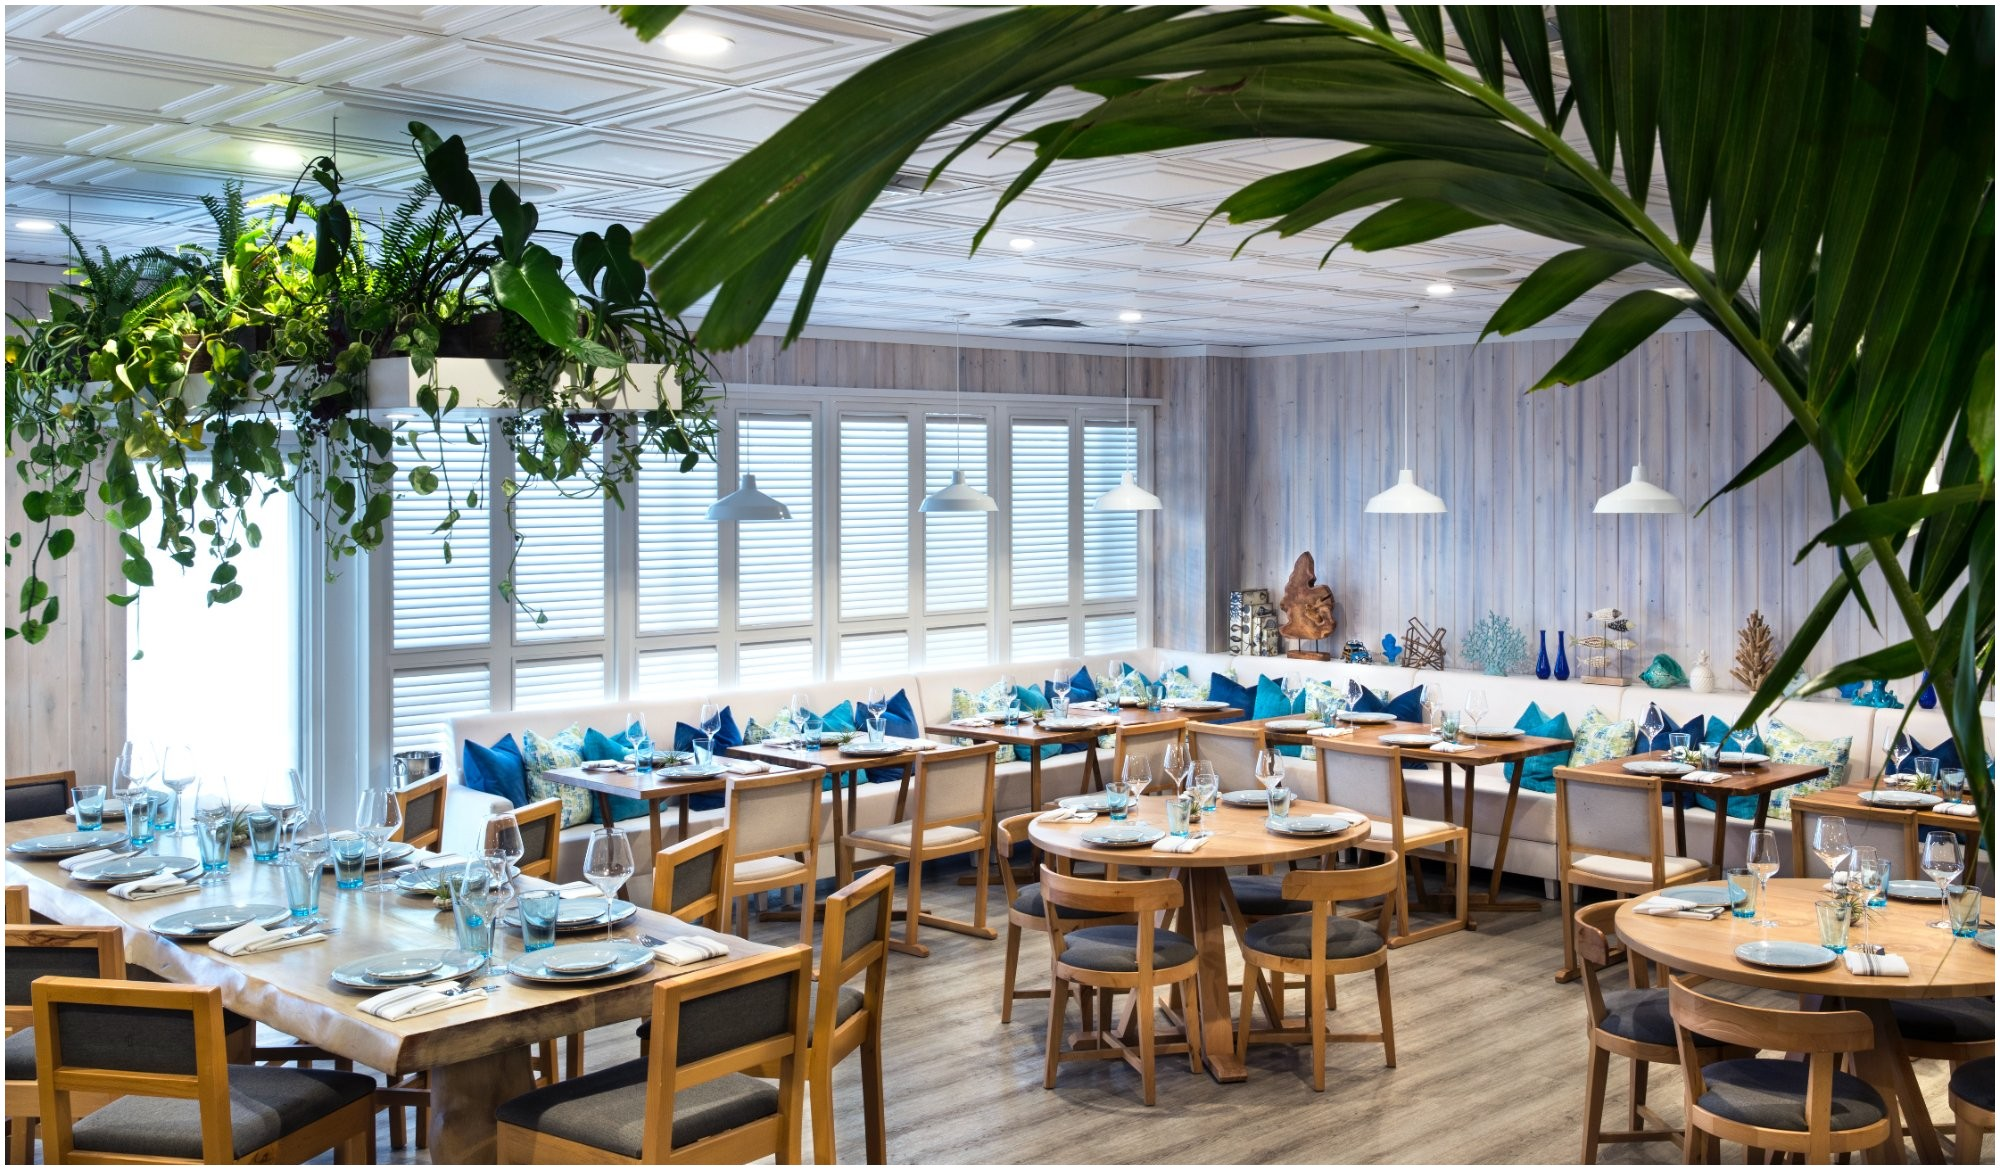 Best Italian Restaurant In south Beach Fl